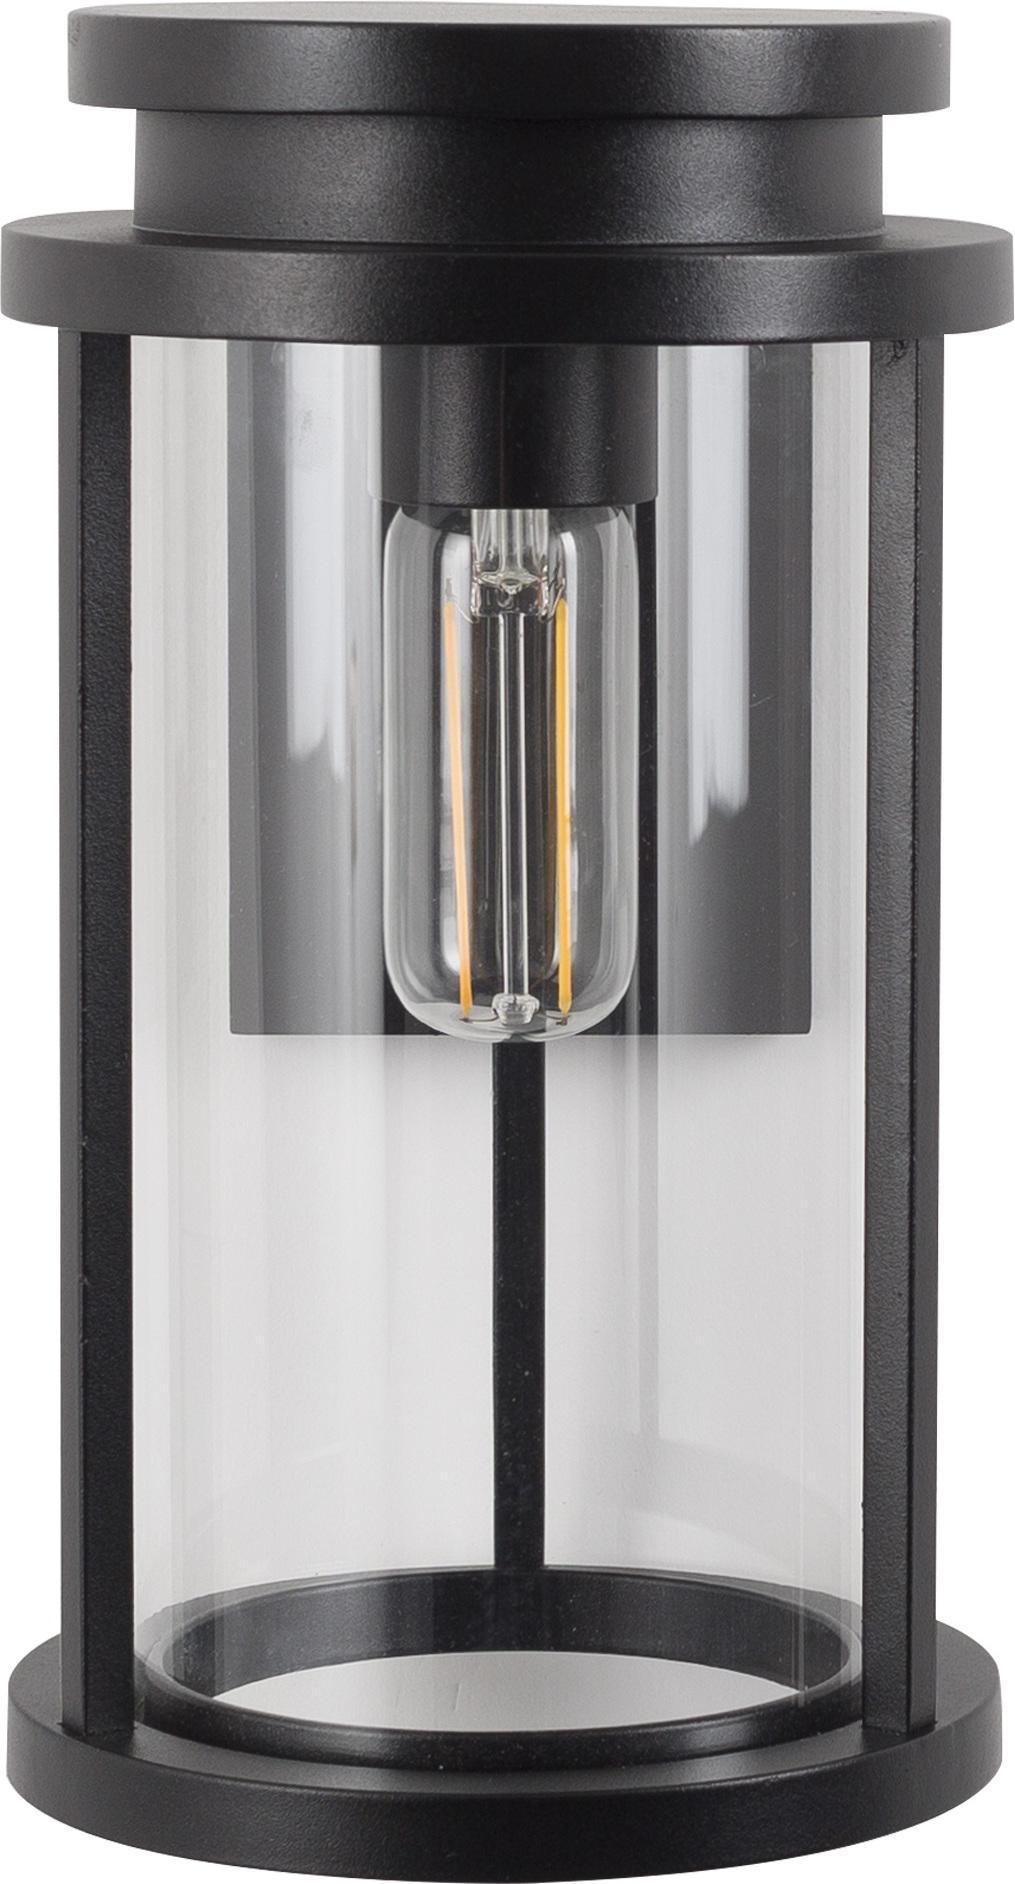 Au en wandlampe sydney l aluminium schwarz ks verlichting kaufen wohn - Aussen wandlampe ...